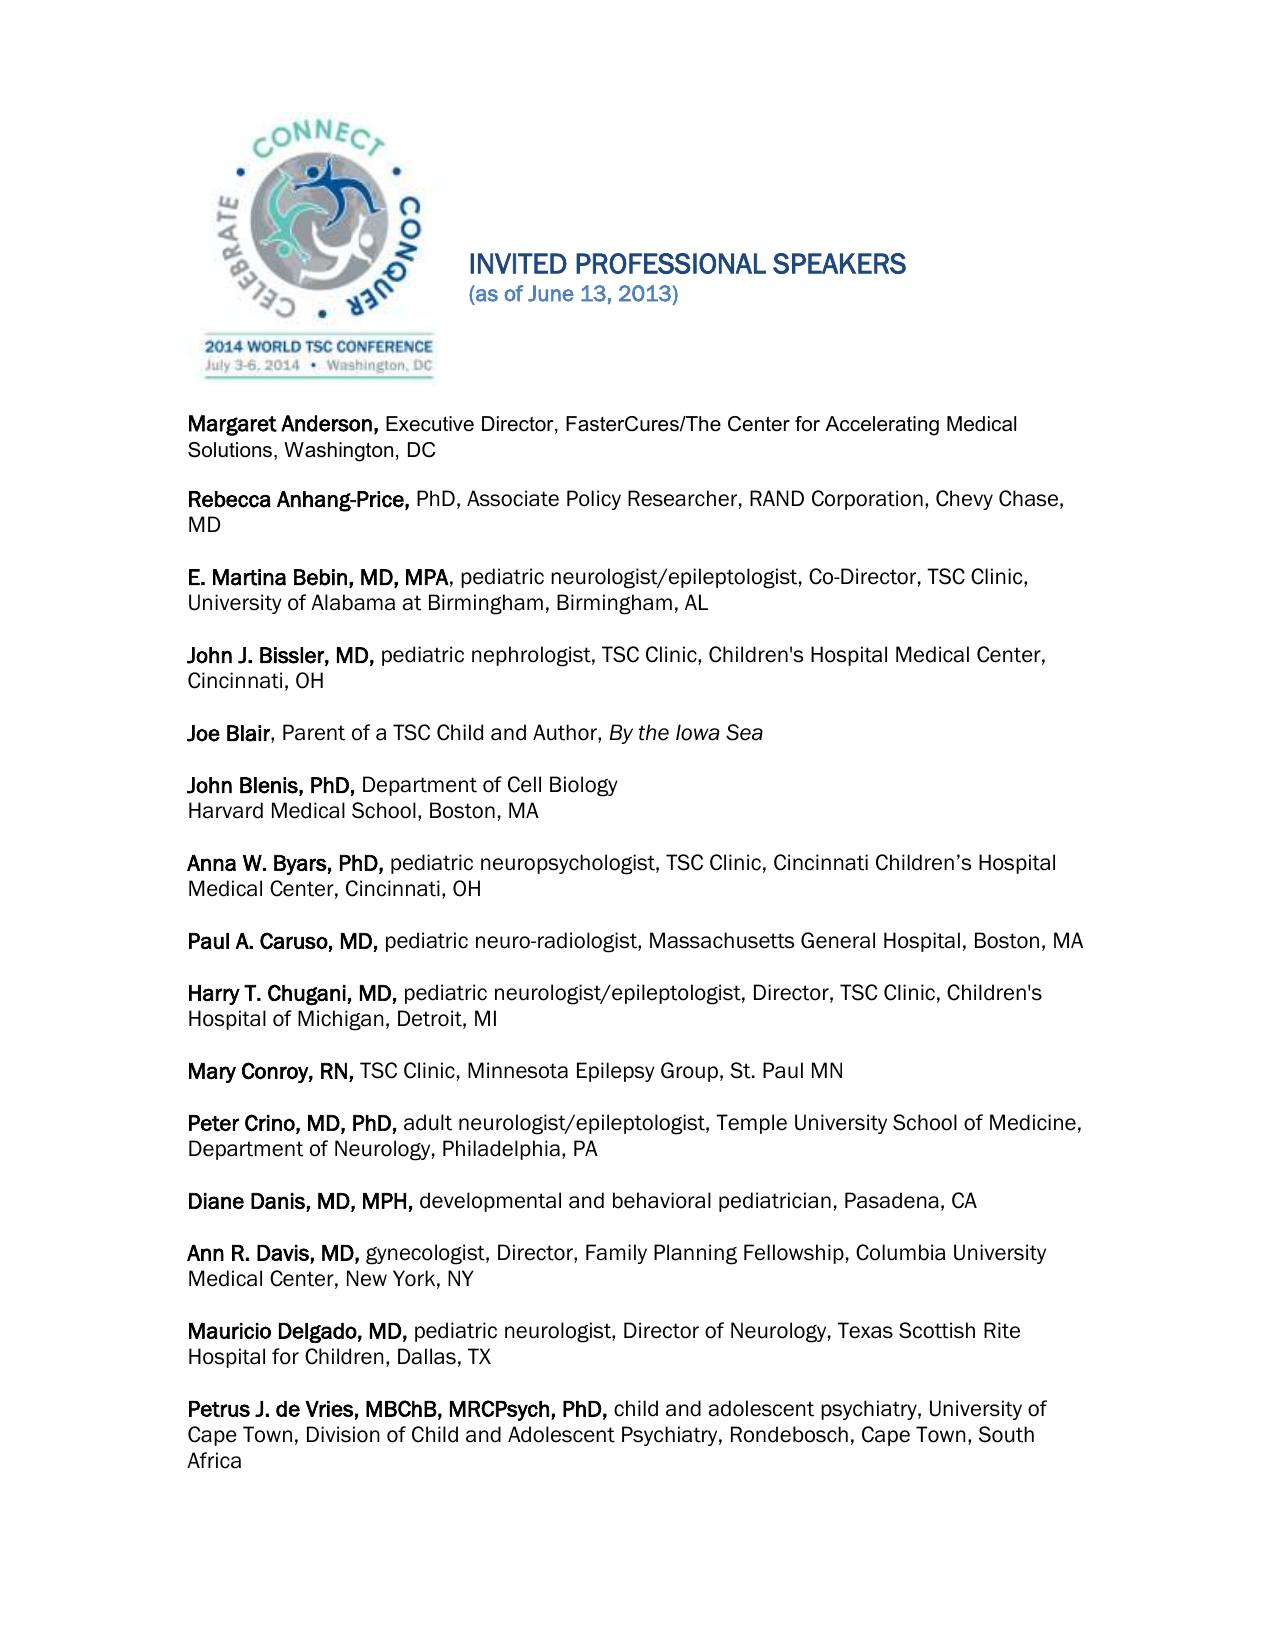 invited professional speakers